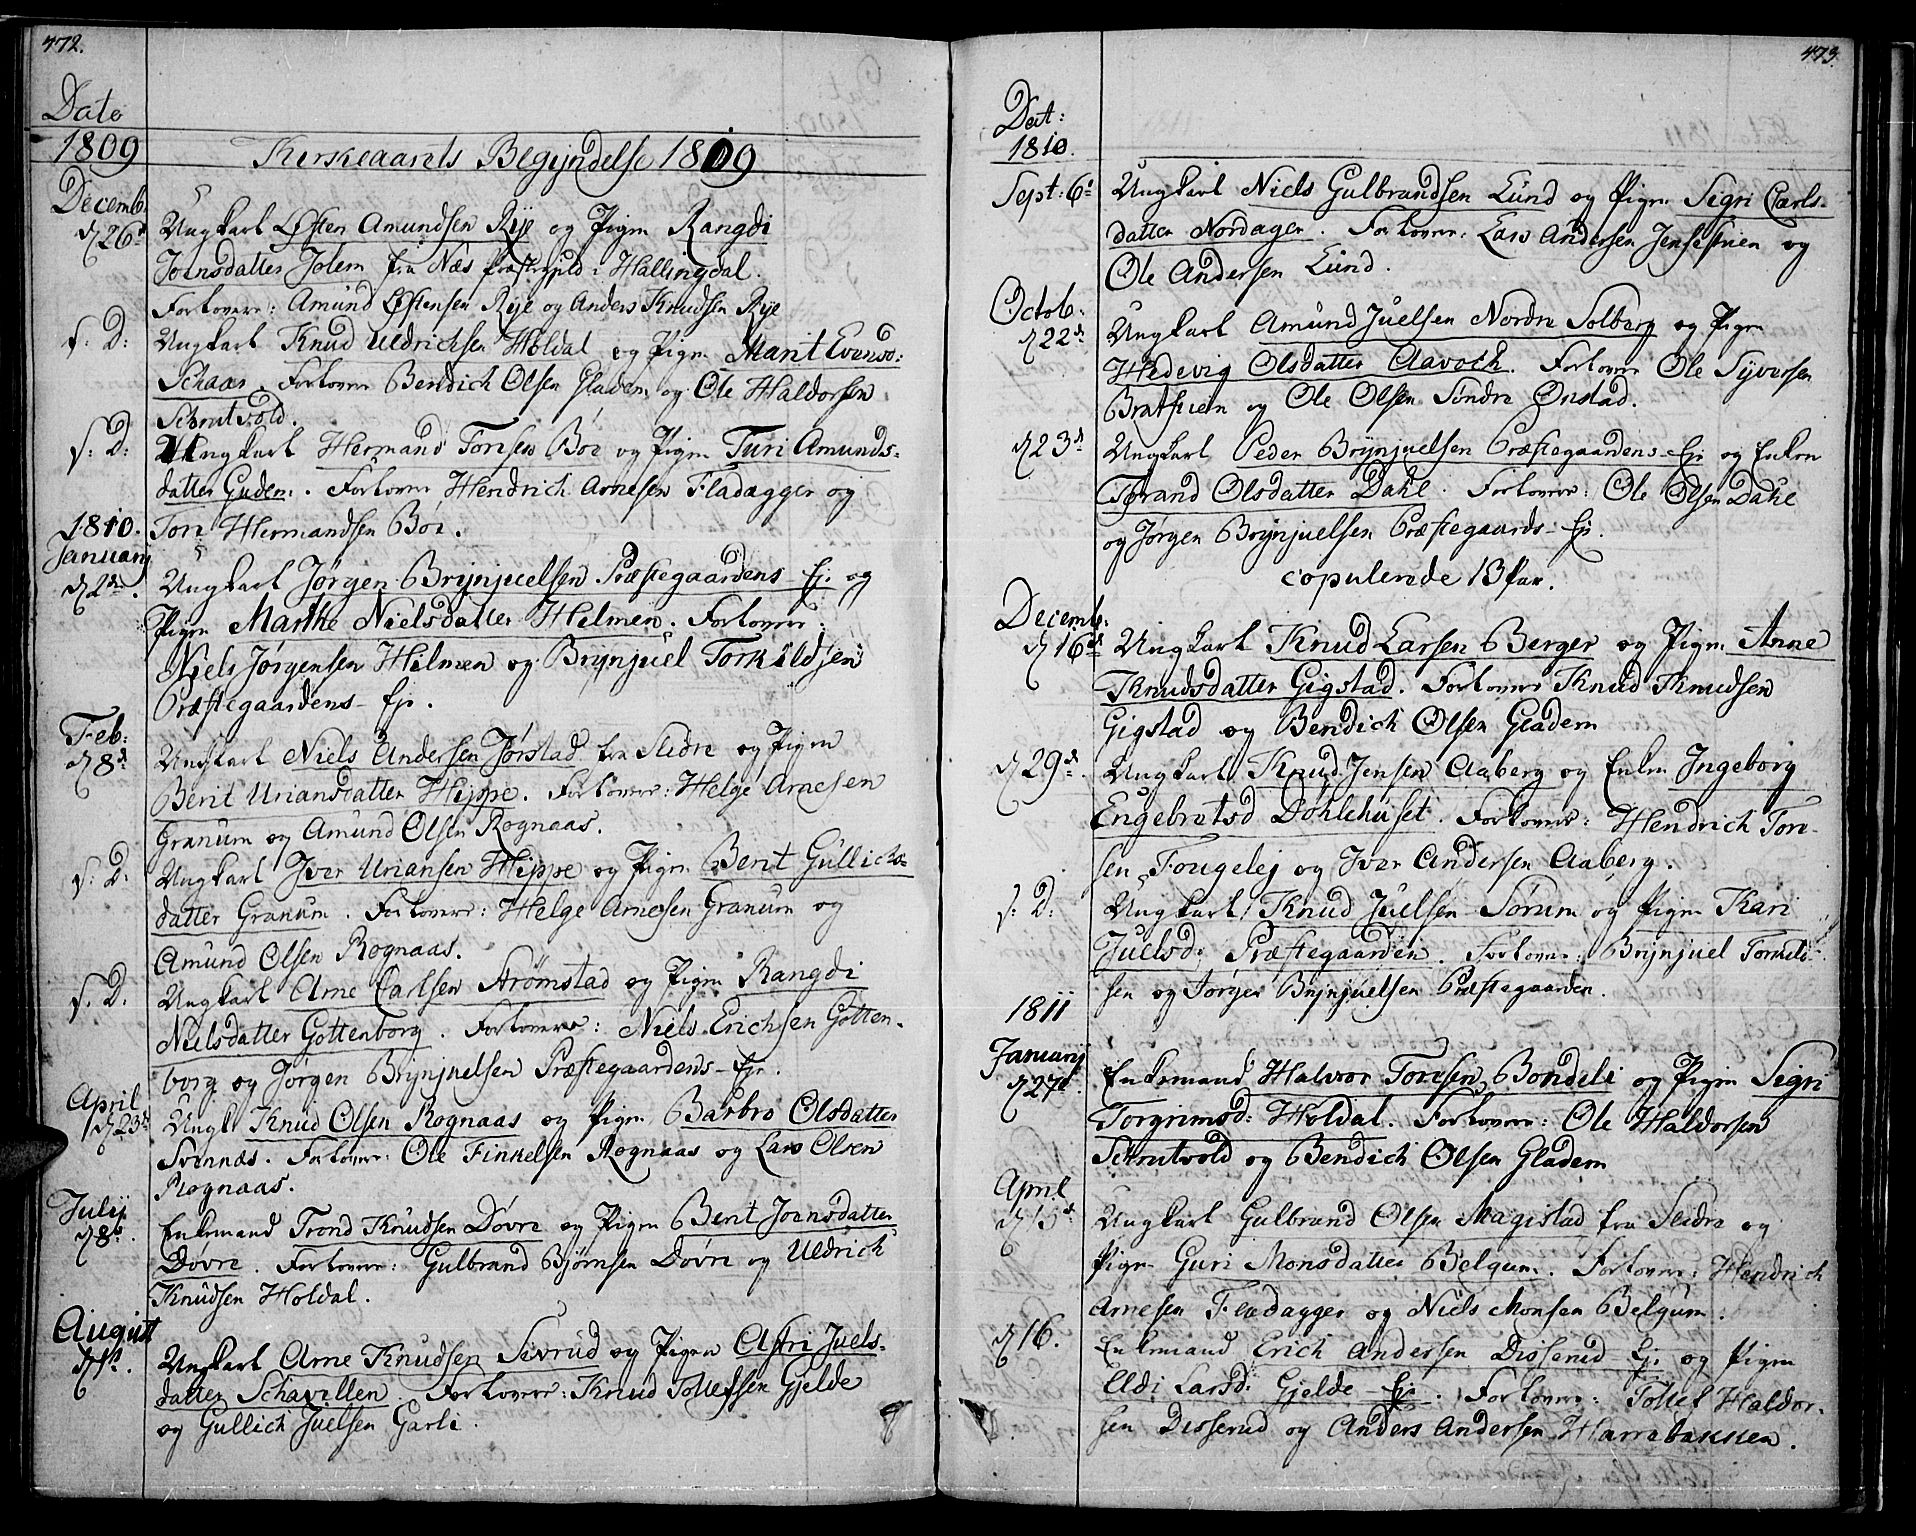 SAH, Nord-Aurdal prestekontor, Ministerialbok nr. 1, 1808-1815, s. 472-473